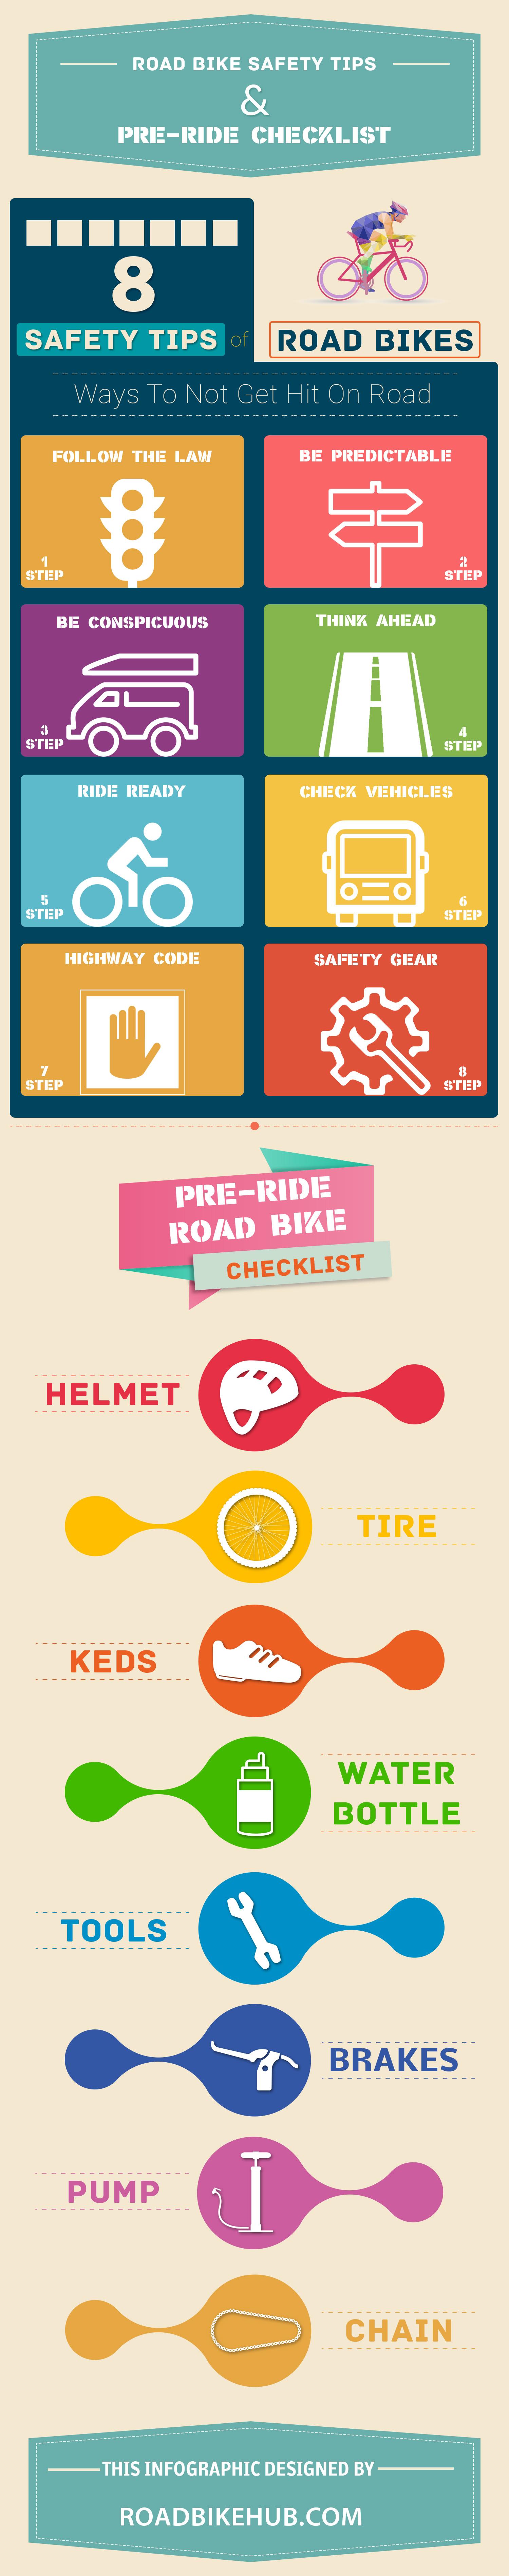 road bike safety tips